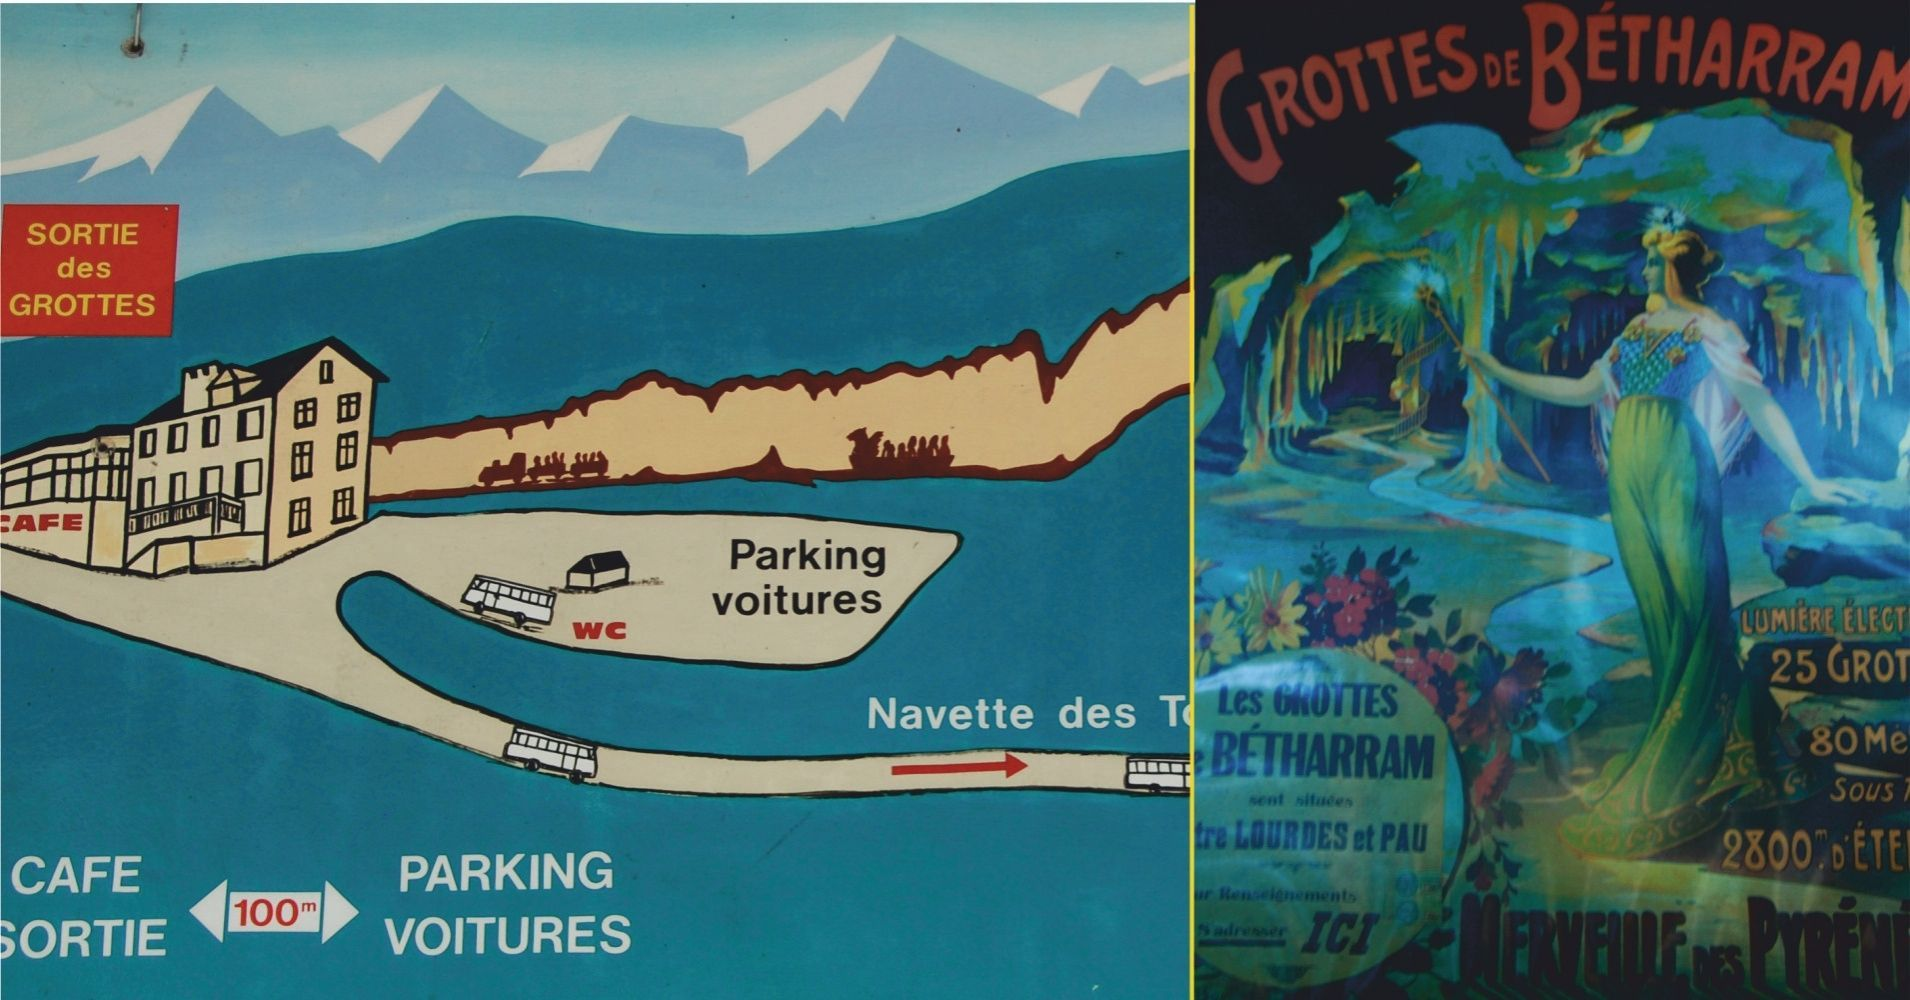 Les Grottes de Bétharram. Nueva Aquitania y Occitania. Pirineos Atlánticos y Altos Pirineos. Francia.